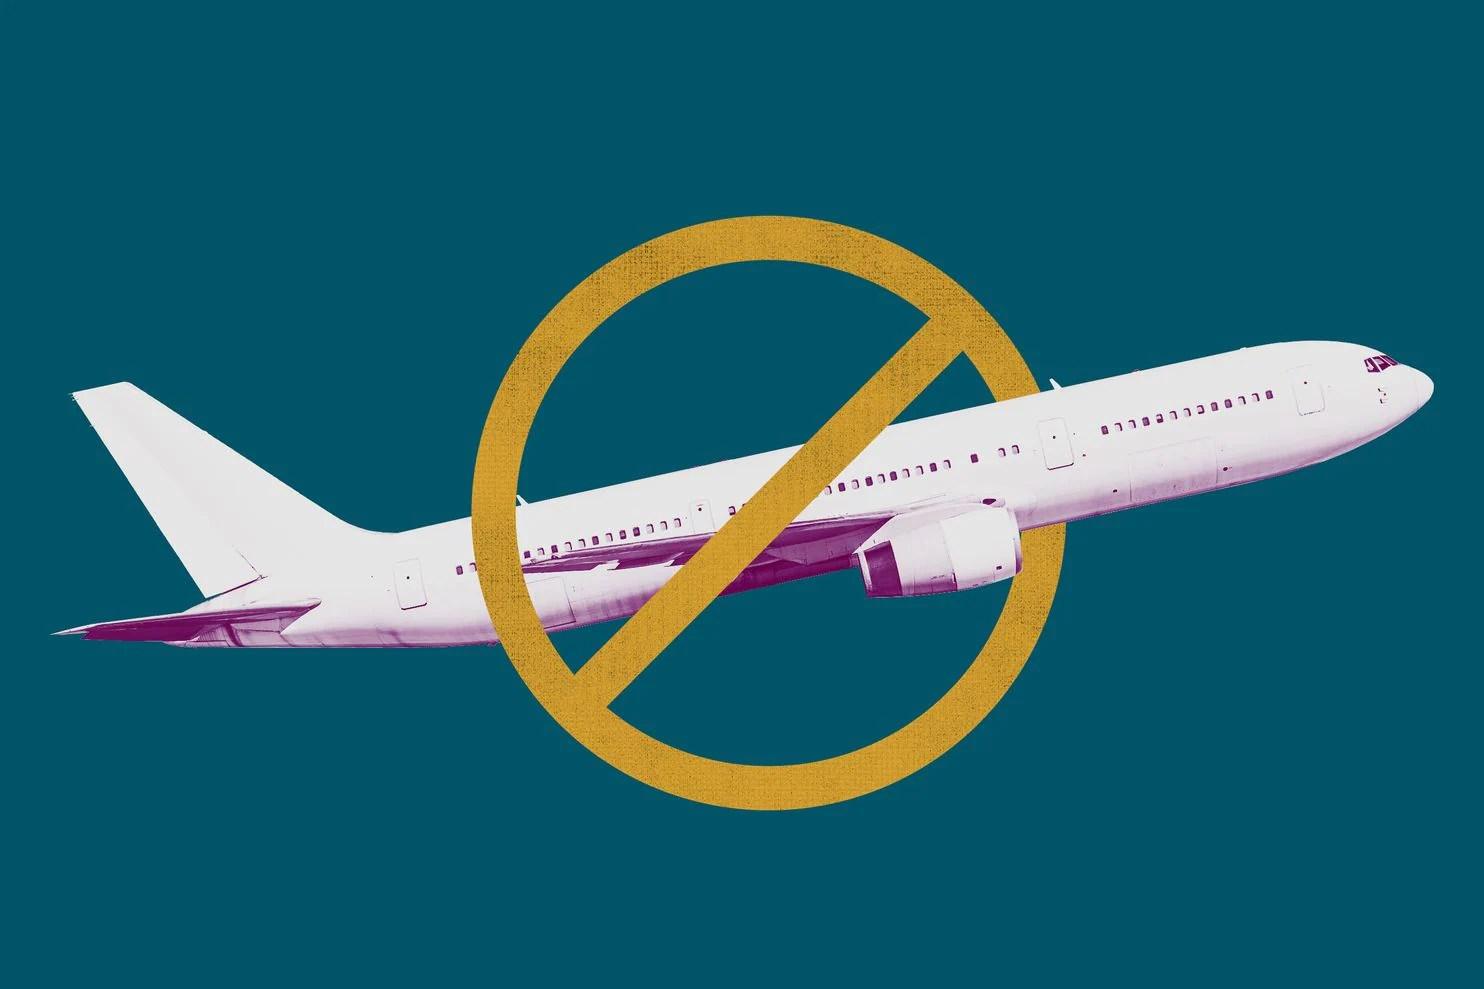 the flight shame movement